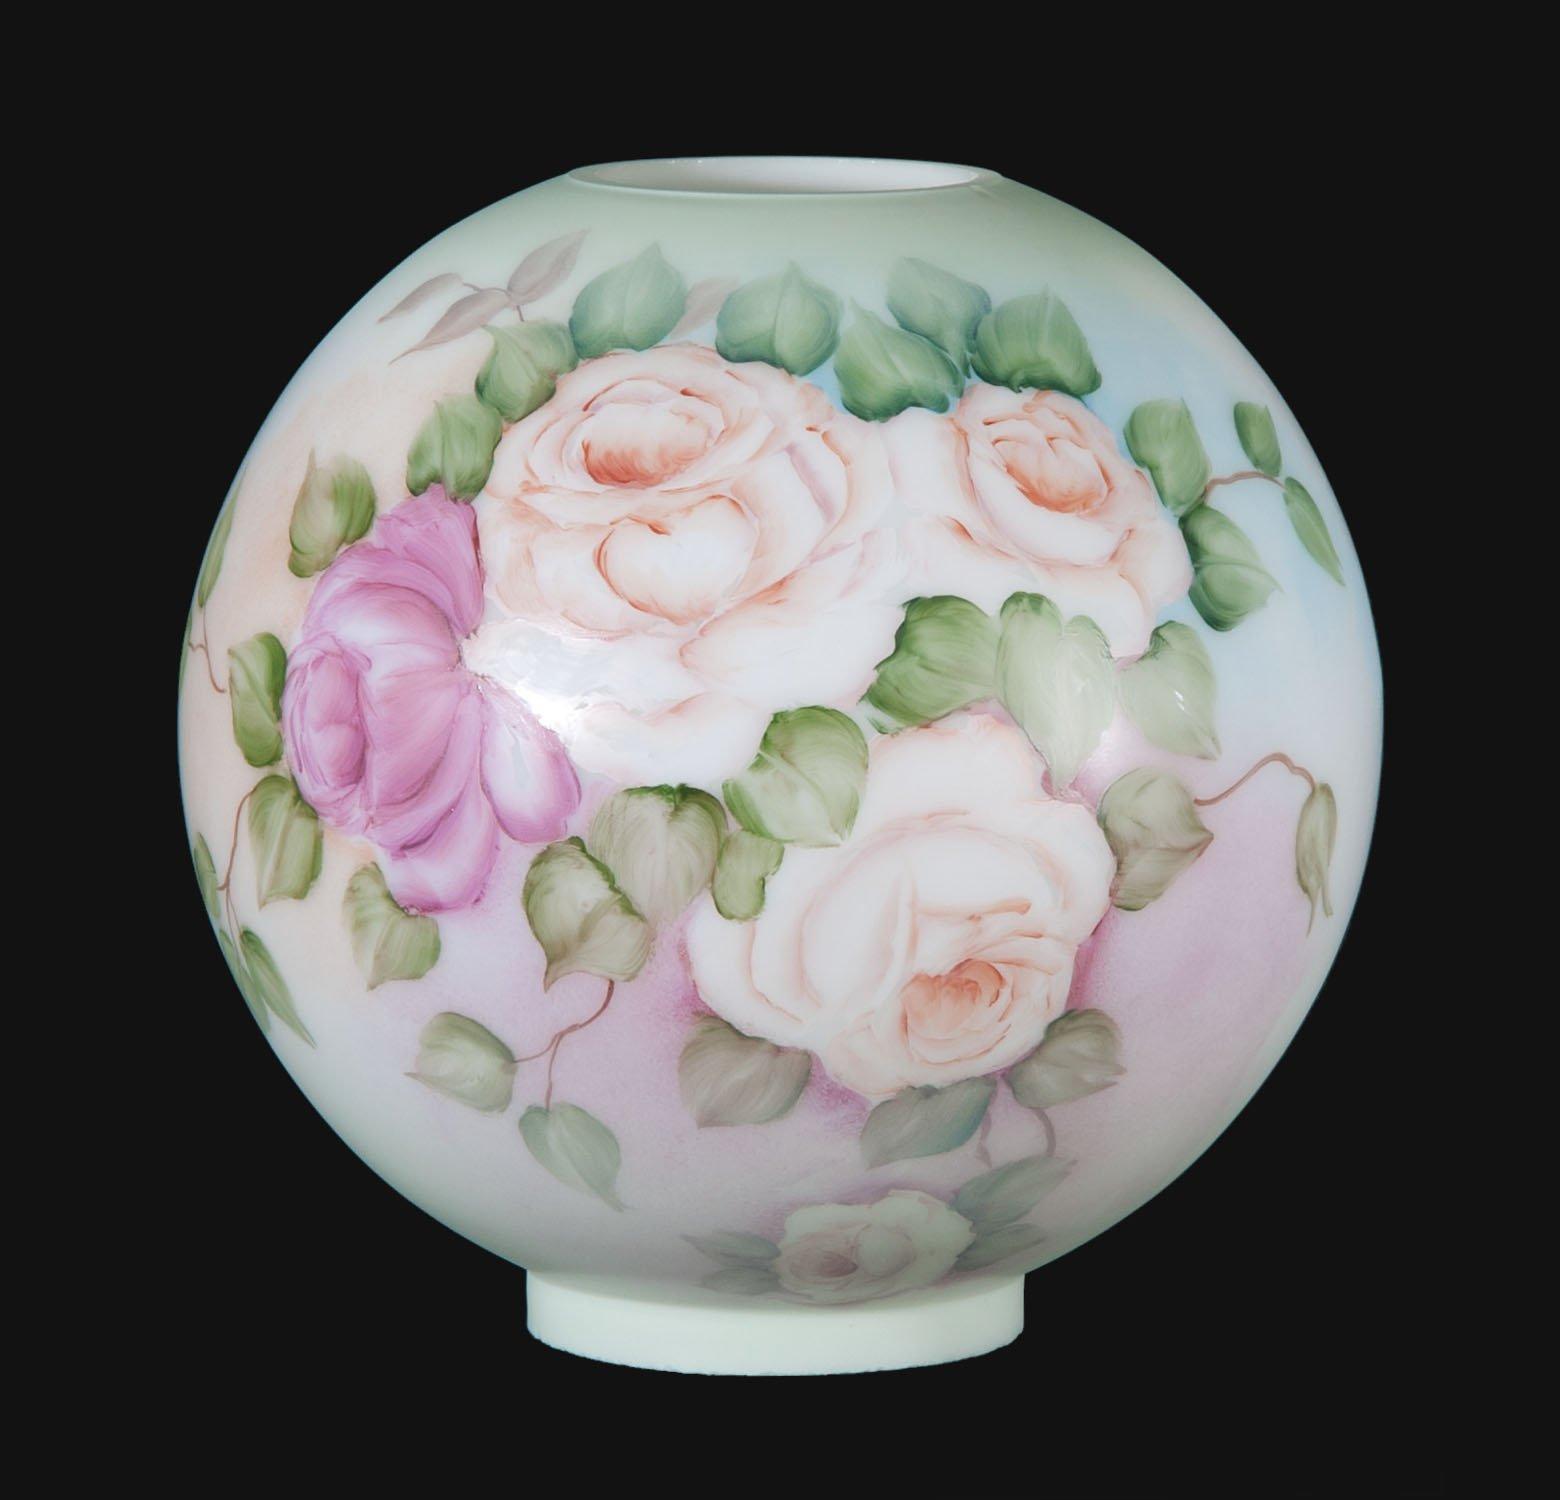 B&P Lamp 10'' Hand Painted Opal Glass Ball Lamp Shade, Friendship Roses Scene